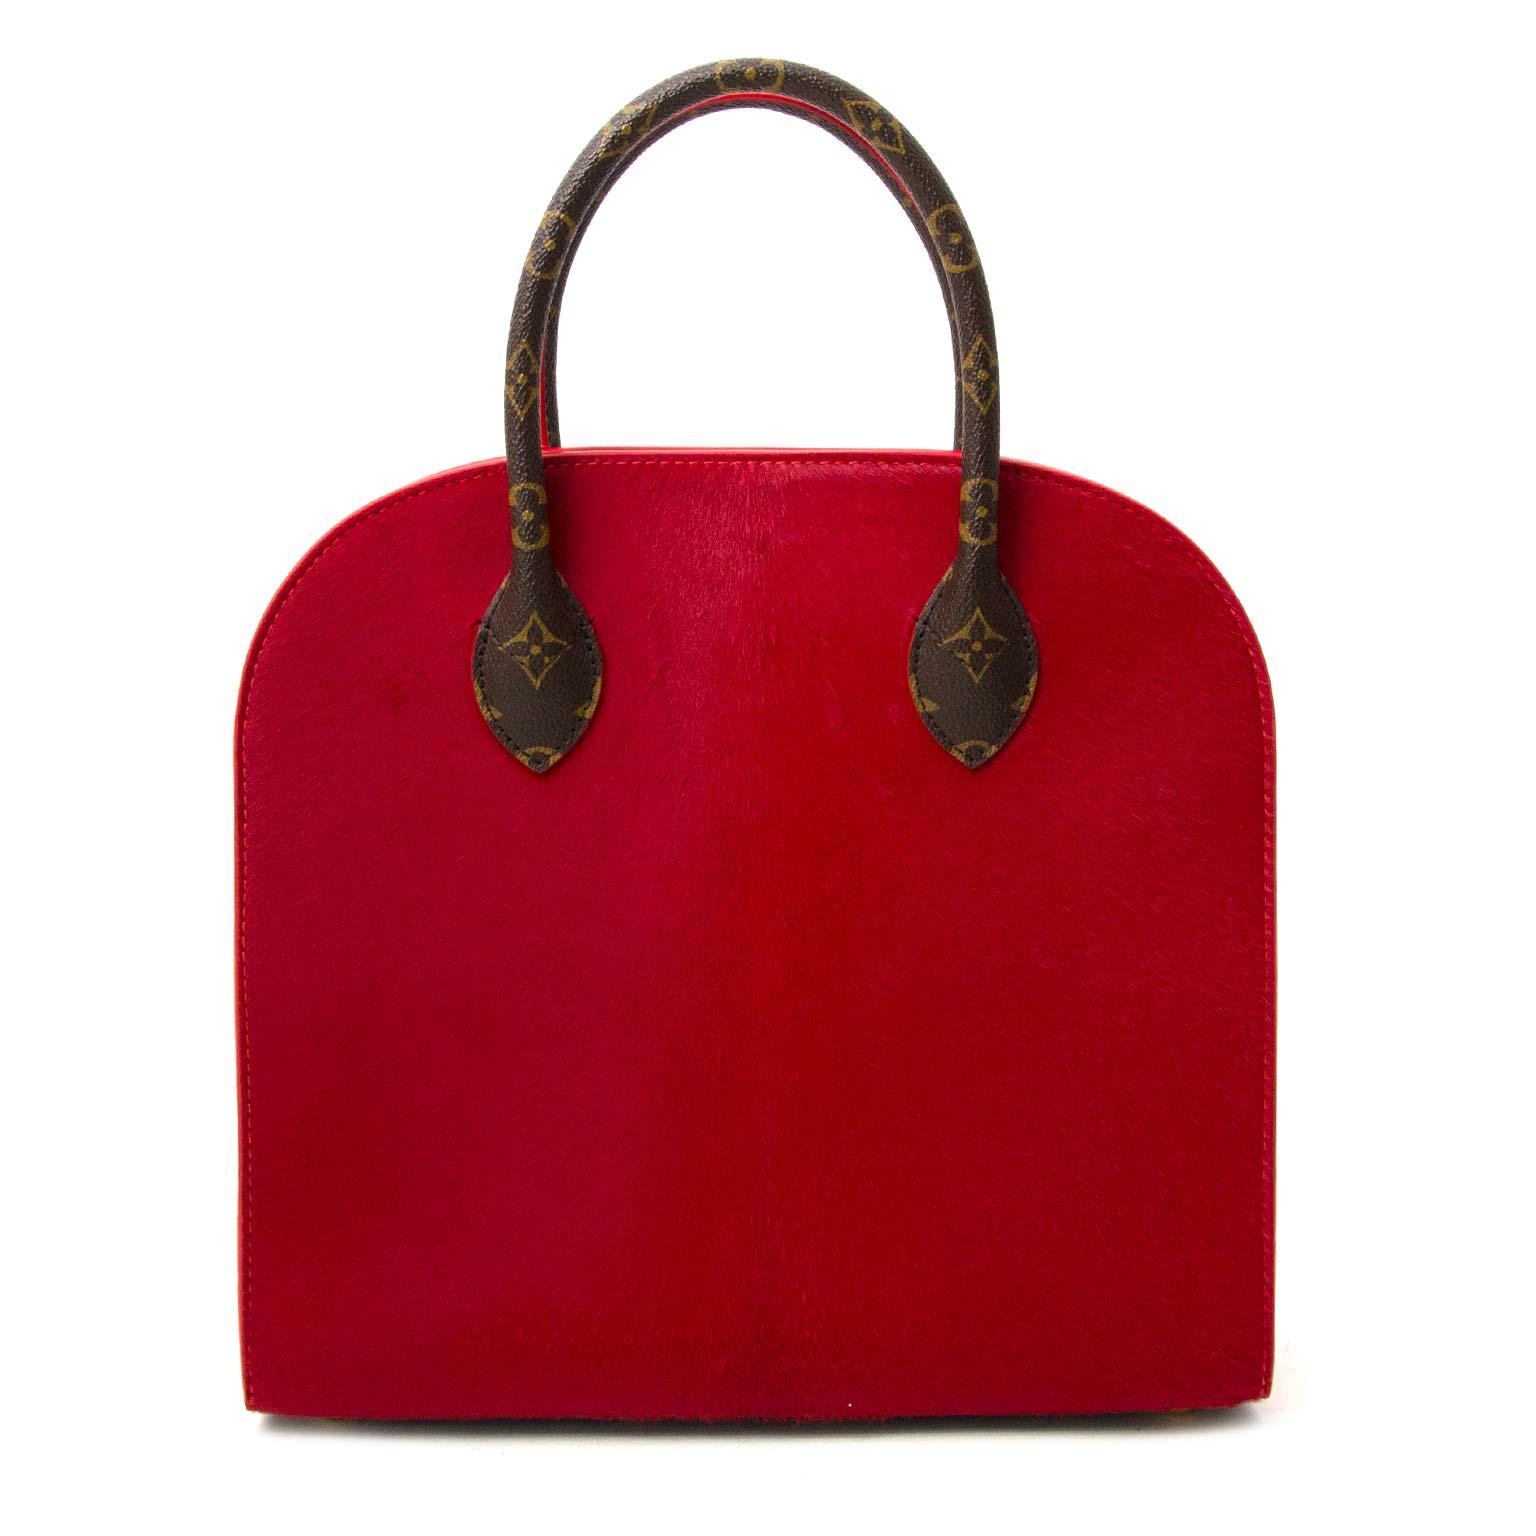 koop online aan de beste prijs Limited Never Used Louis Vuitton Christian Loubouin Shopper bag